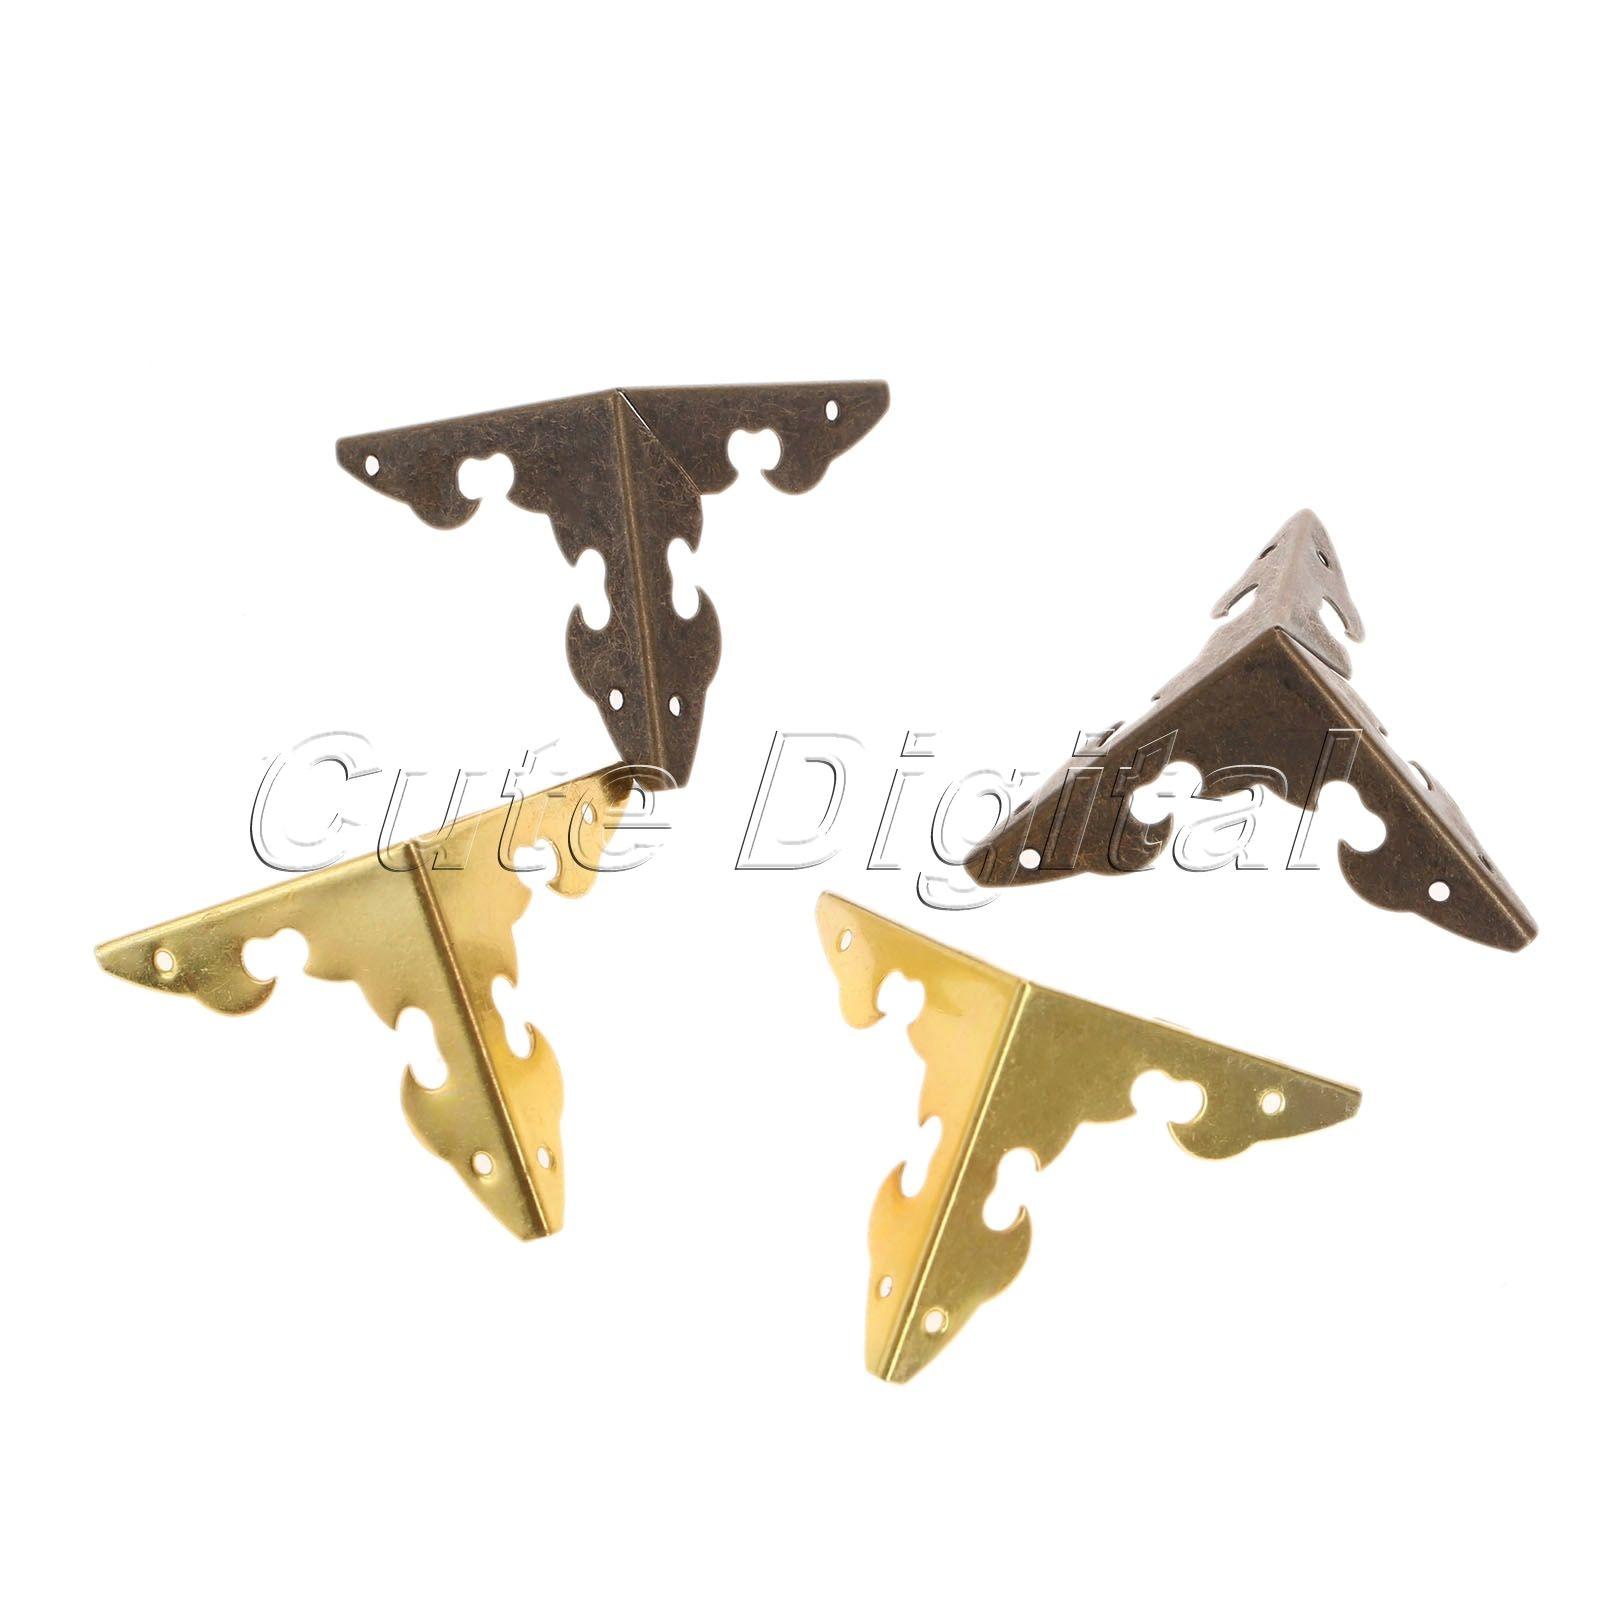 12pcs Antique Bronze/Golden Decorative Metal Corner Brackets For Furniture Wooden Box Feet Corner Protector W/ Screws 30x30x30mm